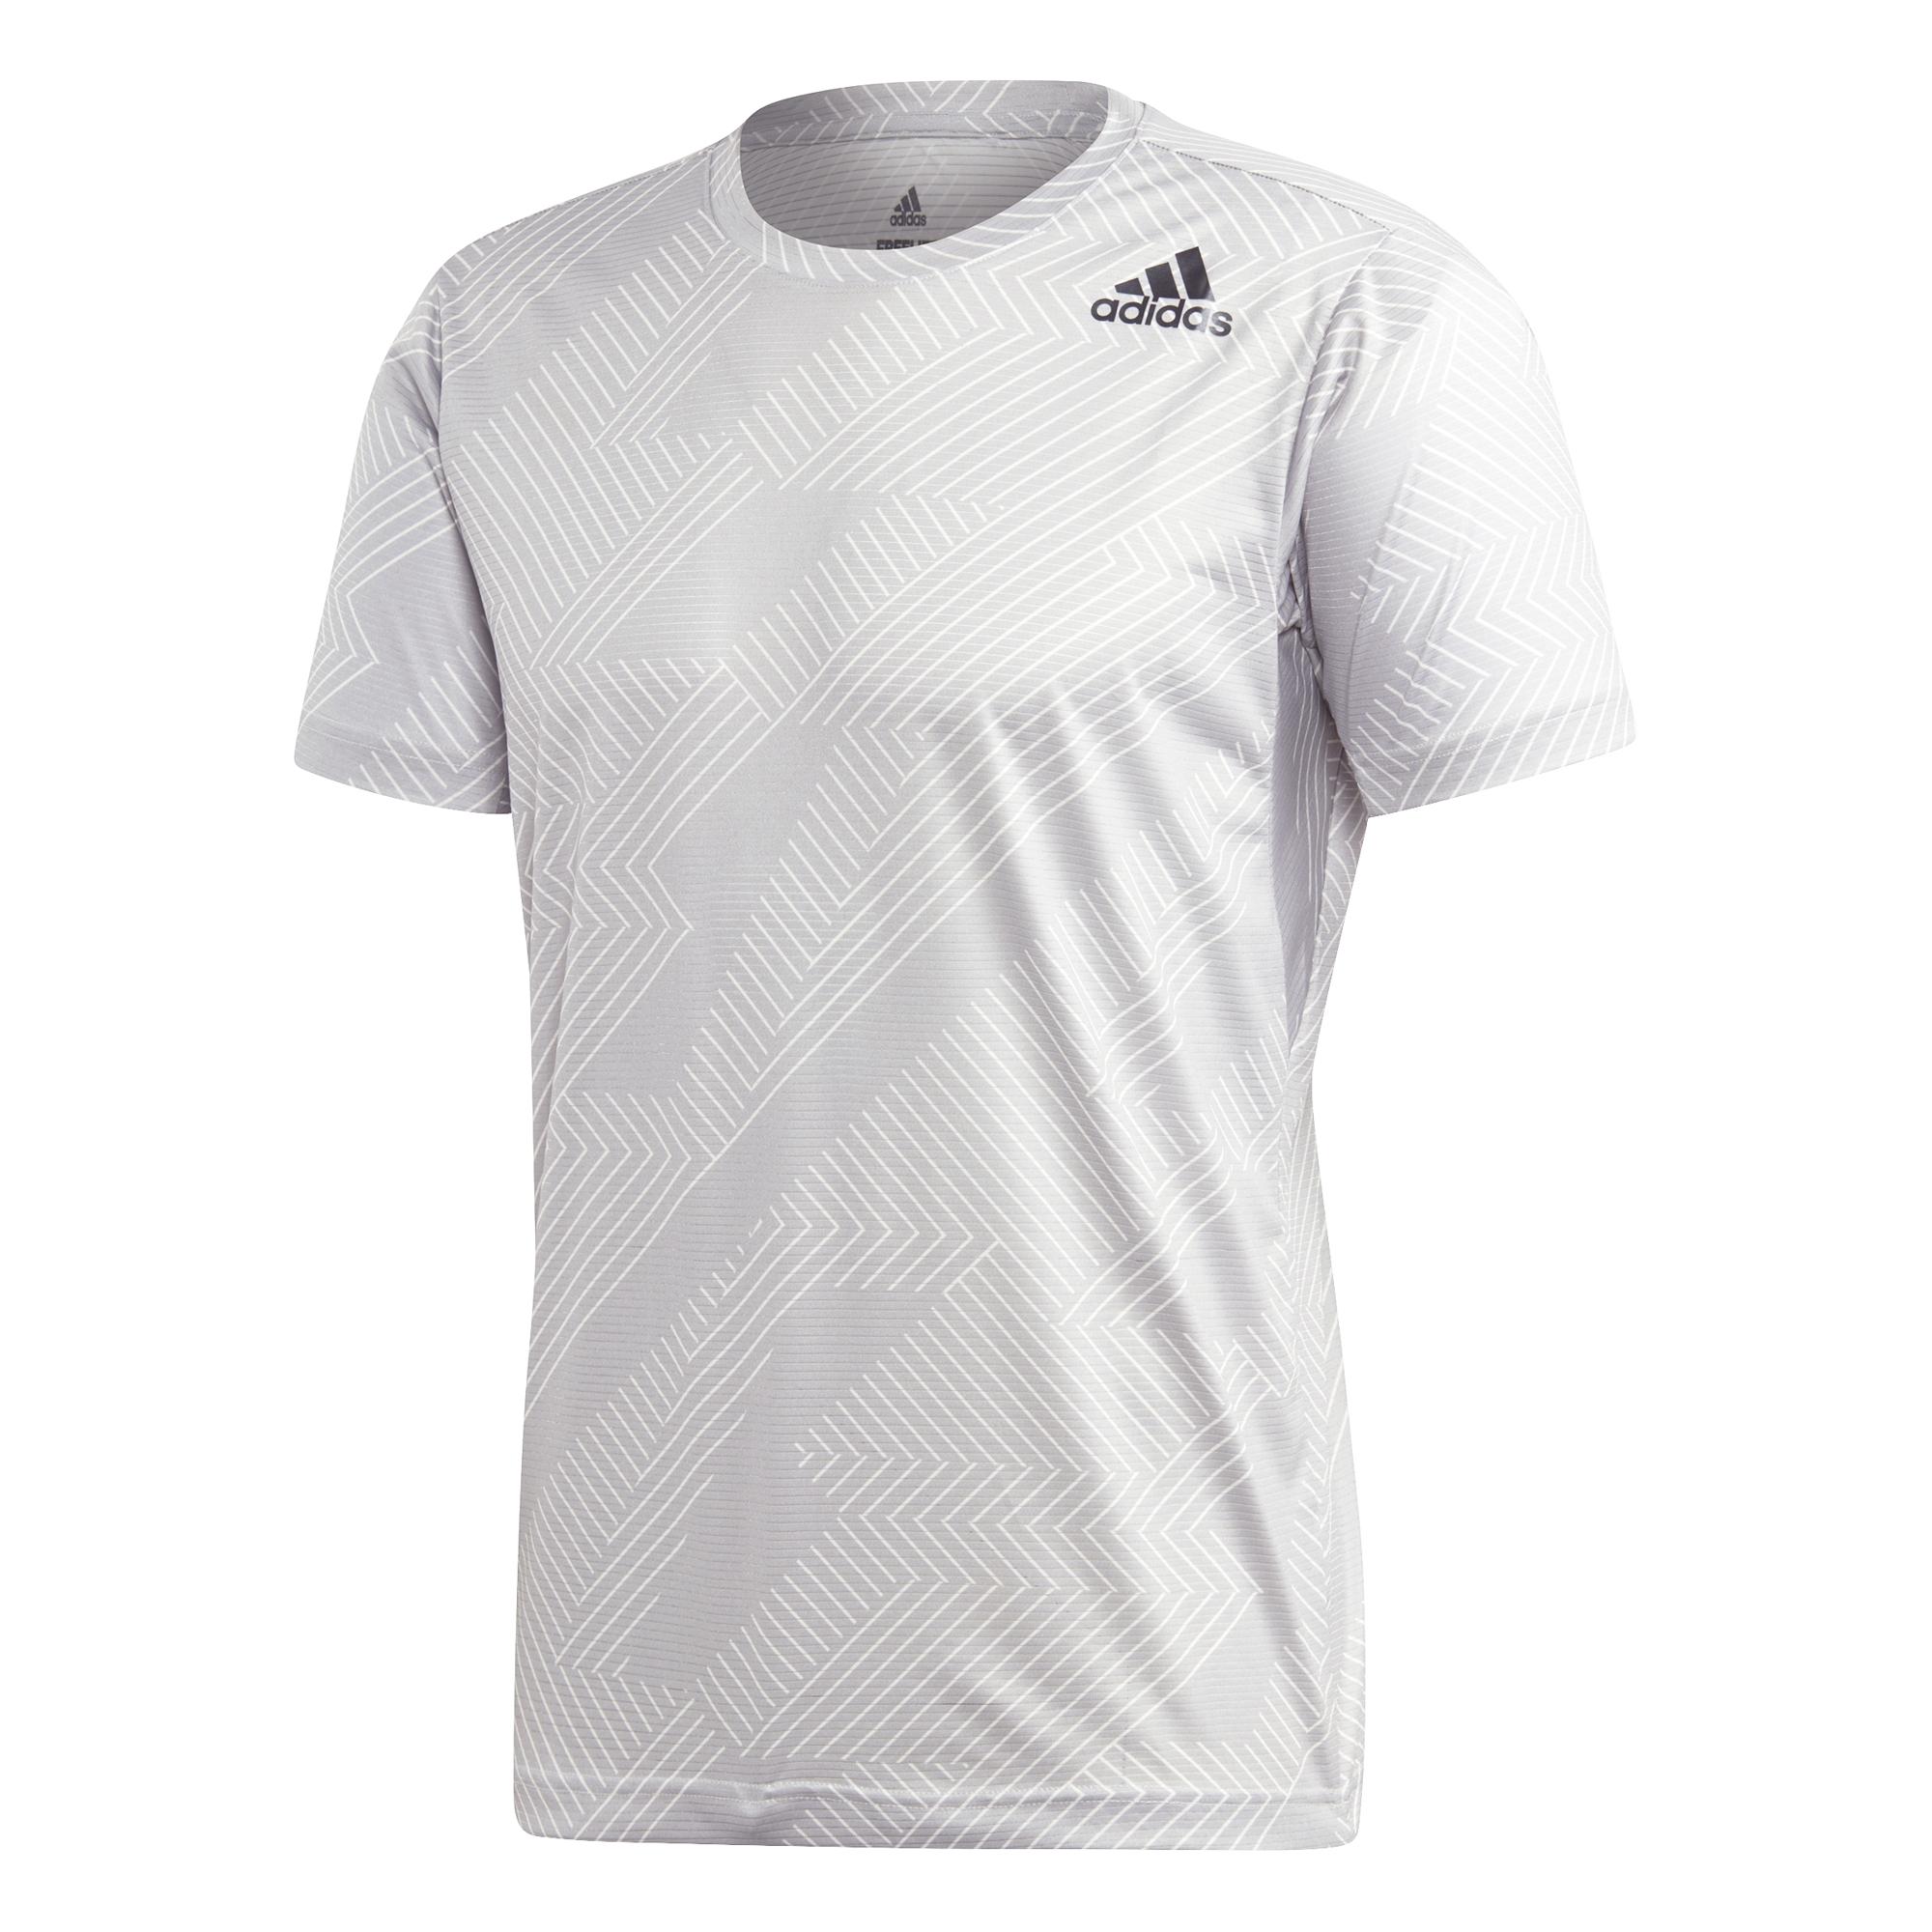 73113dffbdf4 T-shirt adidas Freelift Climacool